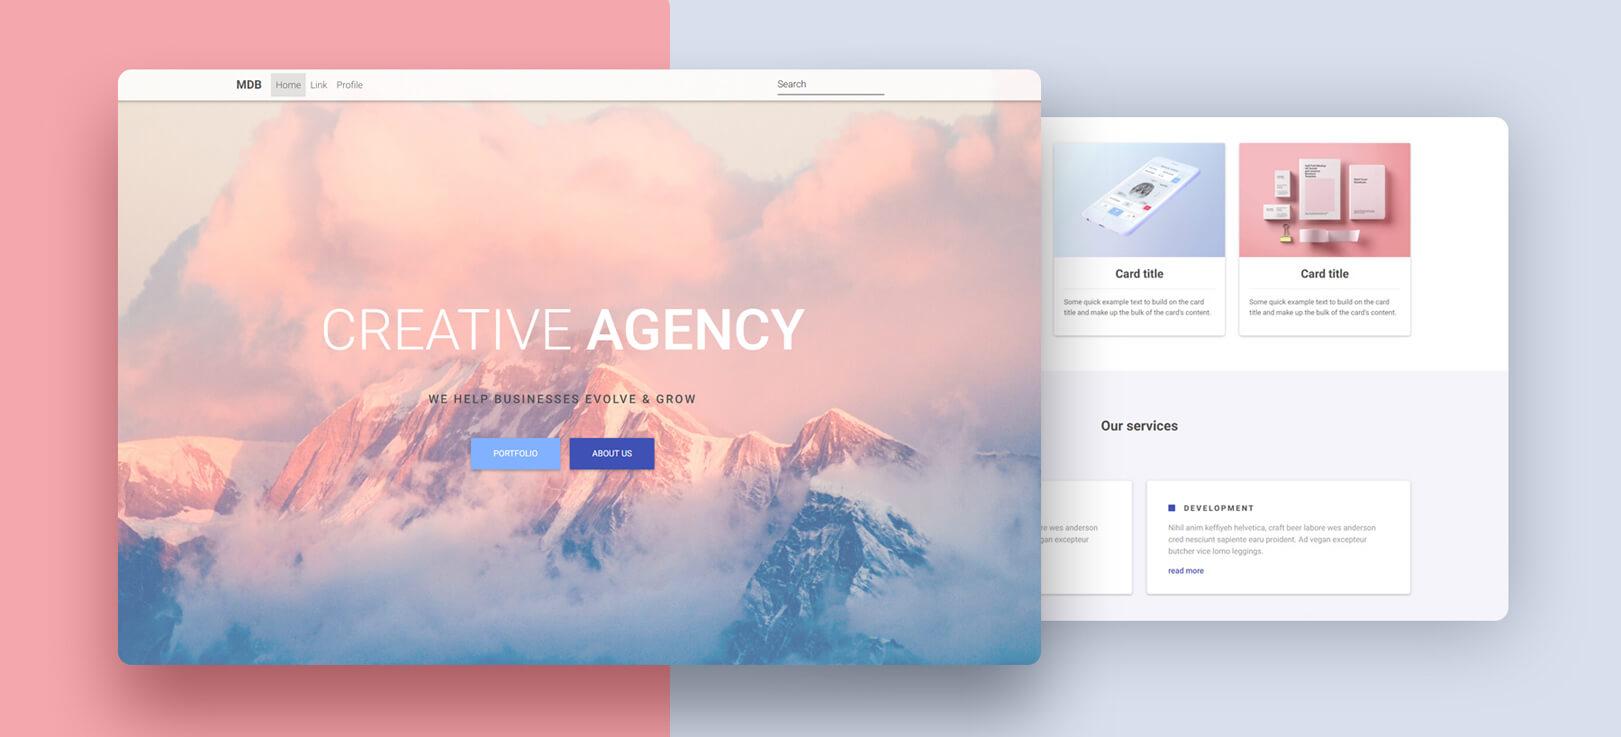 Portfolio Template - Bootstrap 4 & Material Design